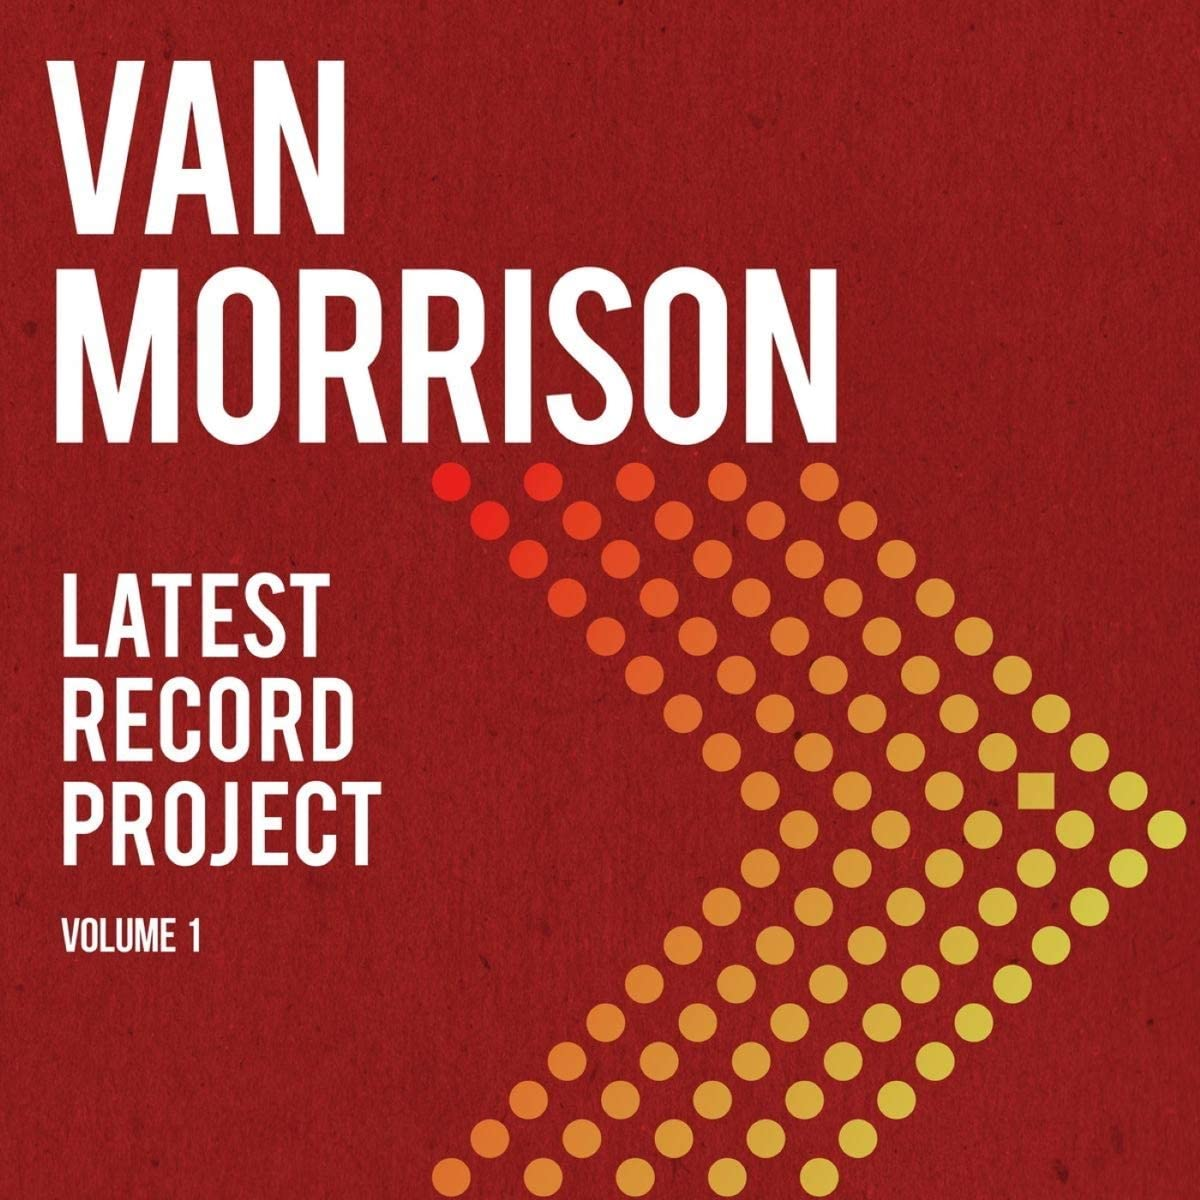 Copertina Vinile 33 giri Latest Record Project, Volume 1 [3 LP] di Van Morrison